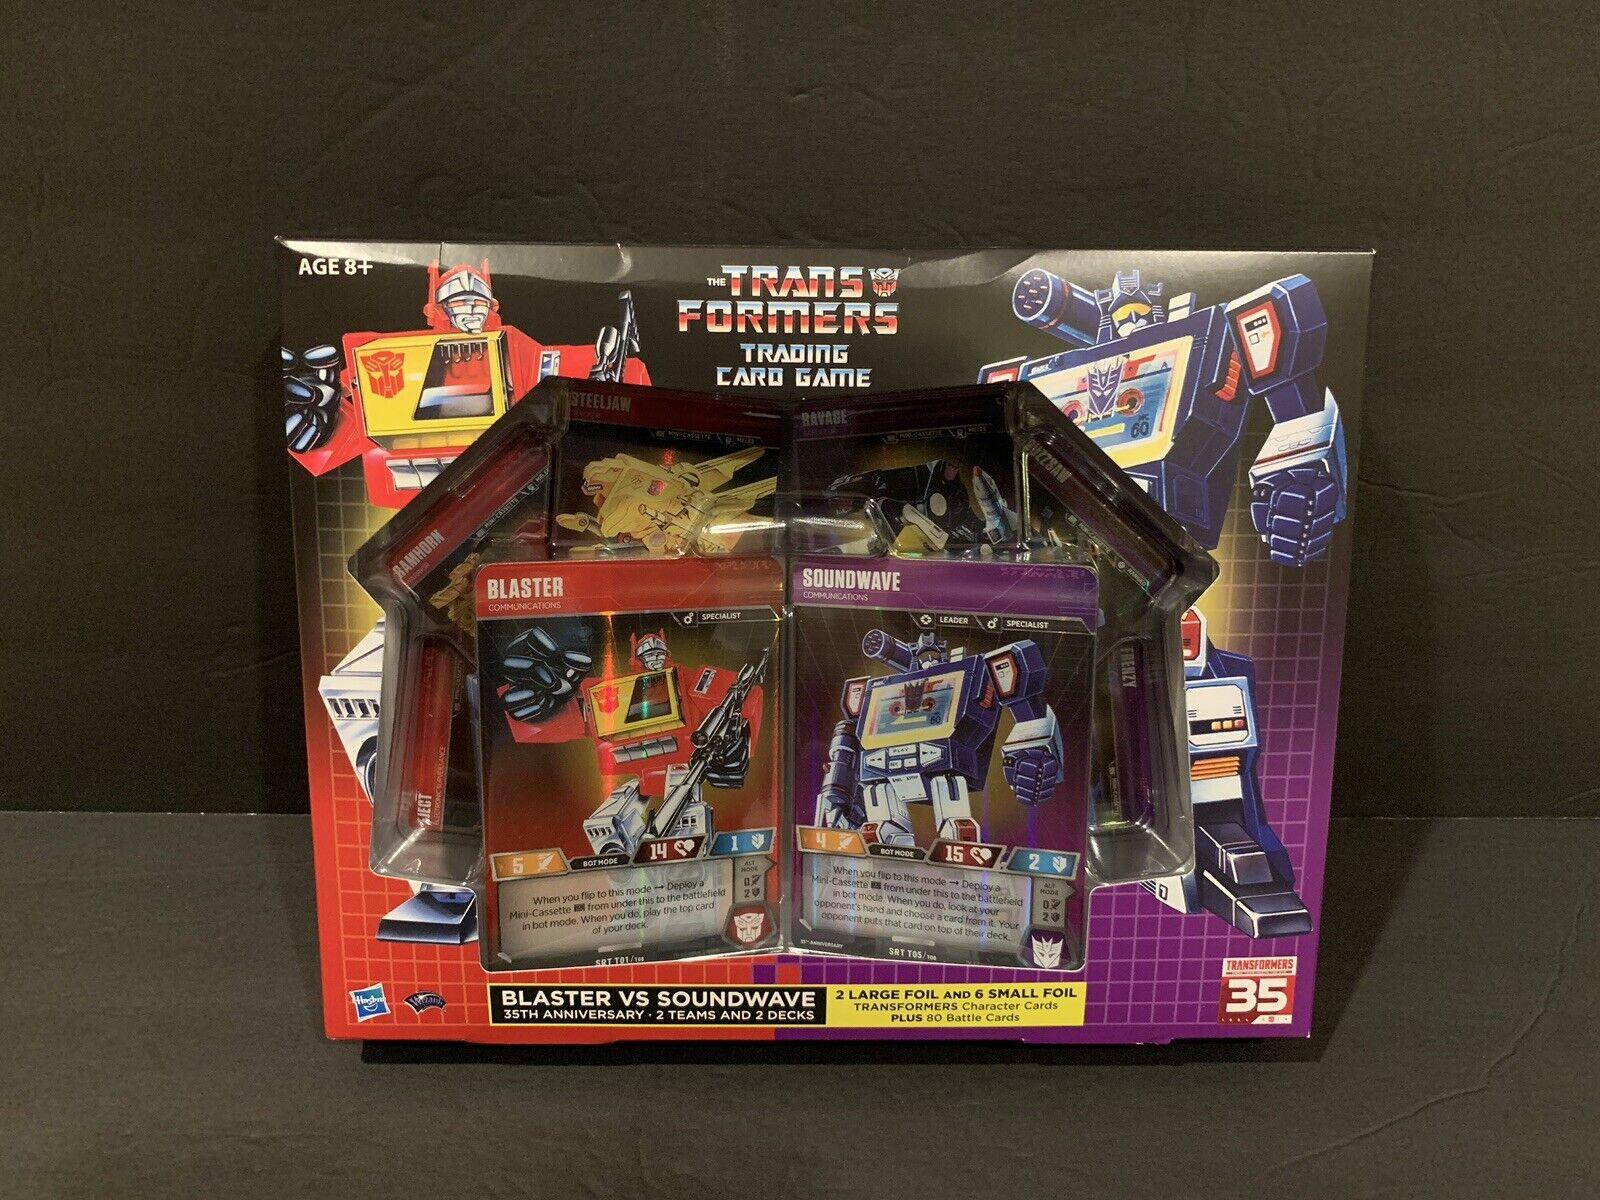 Transformers 35th Anniversary Blaster Vs Soundwave 2 Deck Set Tcg Sdcc 2019 Nisb Ebay